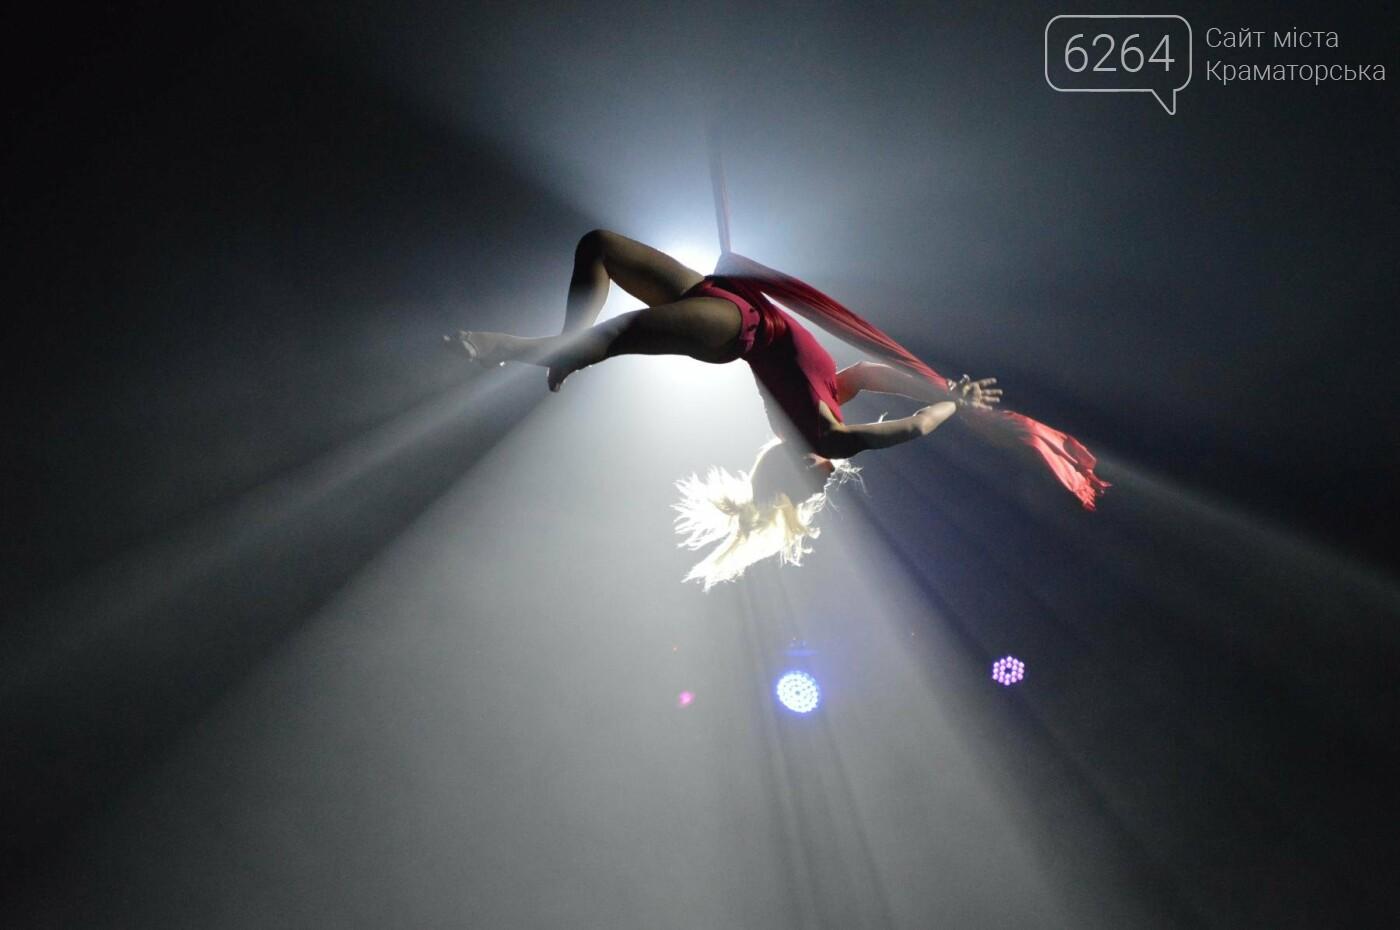 Новое шоу цирка «Кобзов» произвело фурор в Краматорске, фото-5